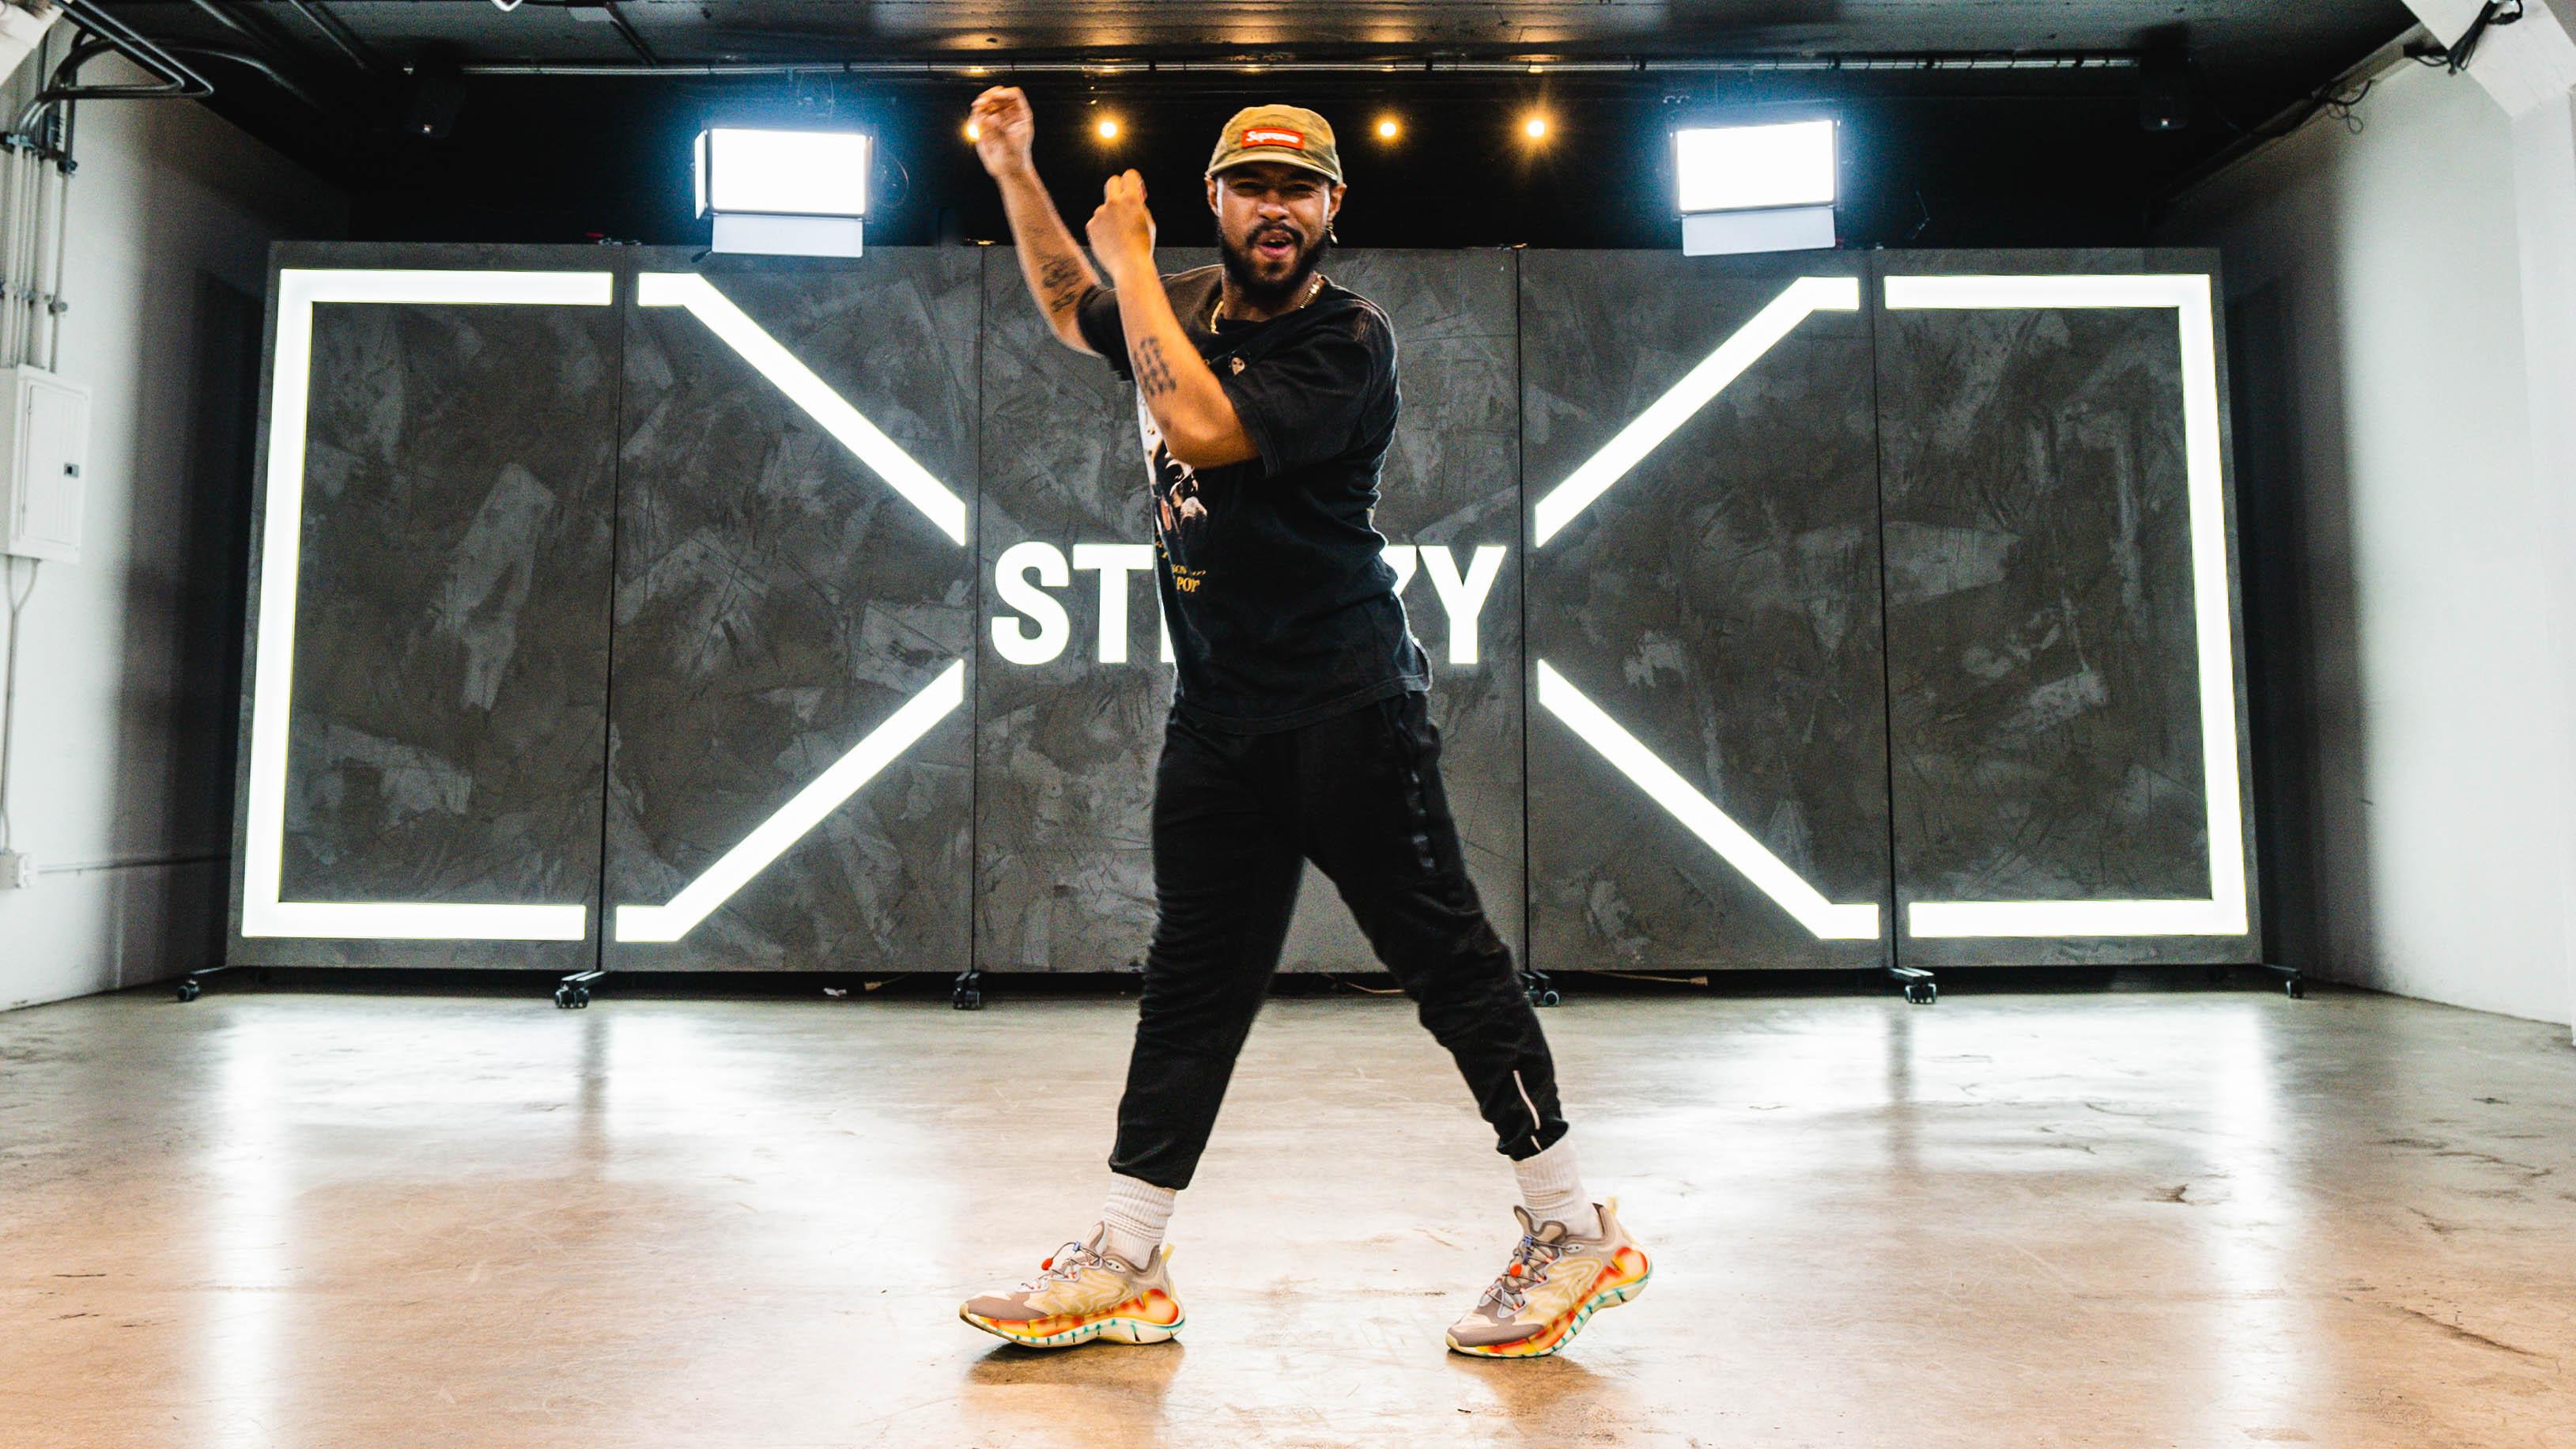 Brandon Beastboi Juezan doing the carlton dance move